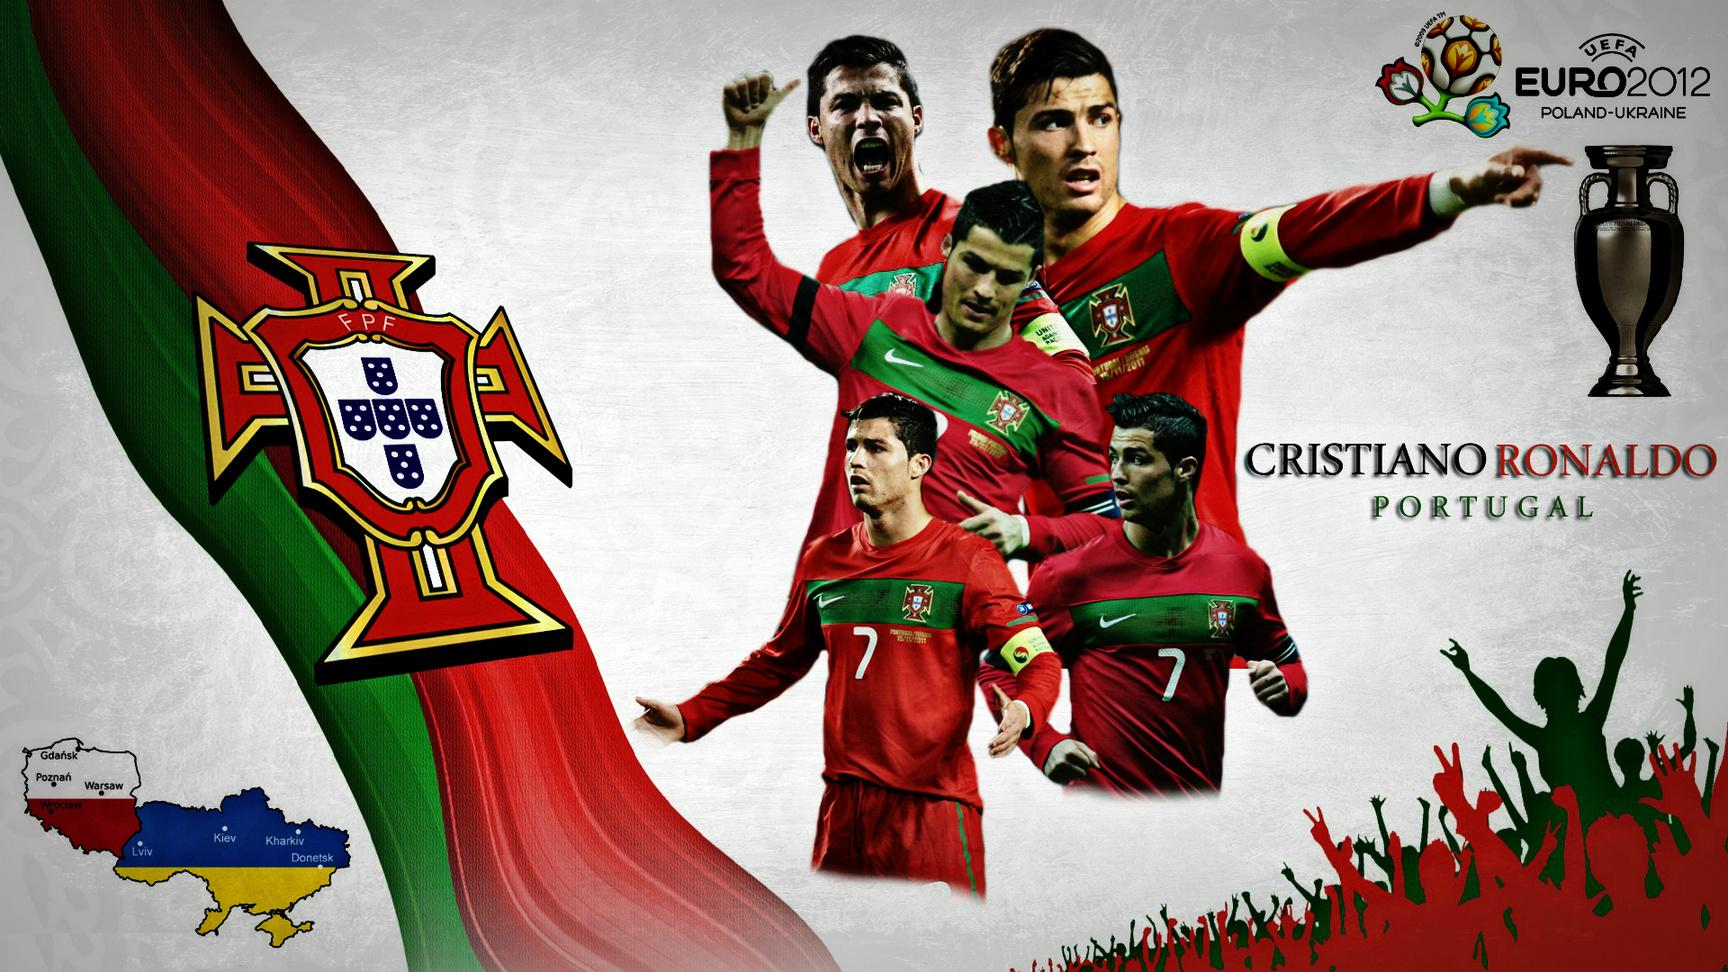 Portugal Soccer Team Logo Wallpaper wwwpixsharkcom 1728x972